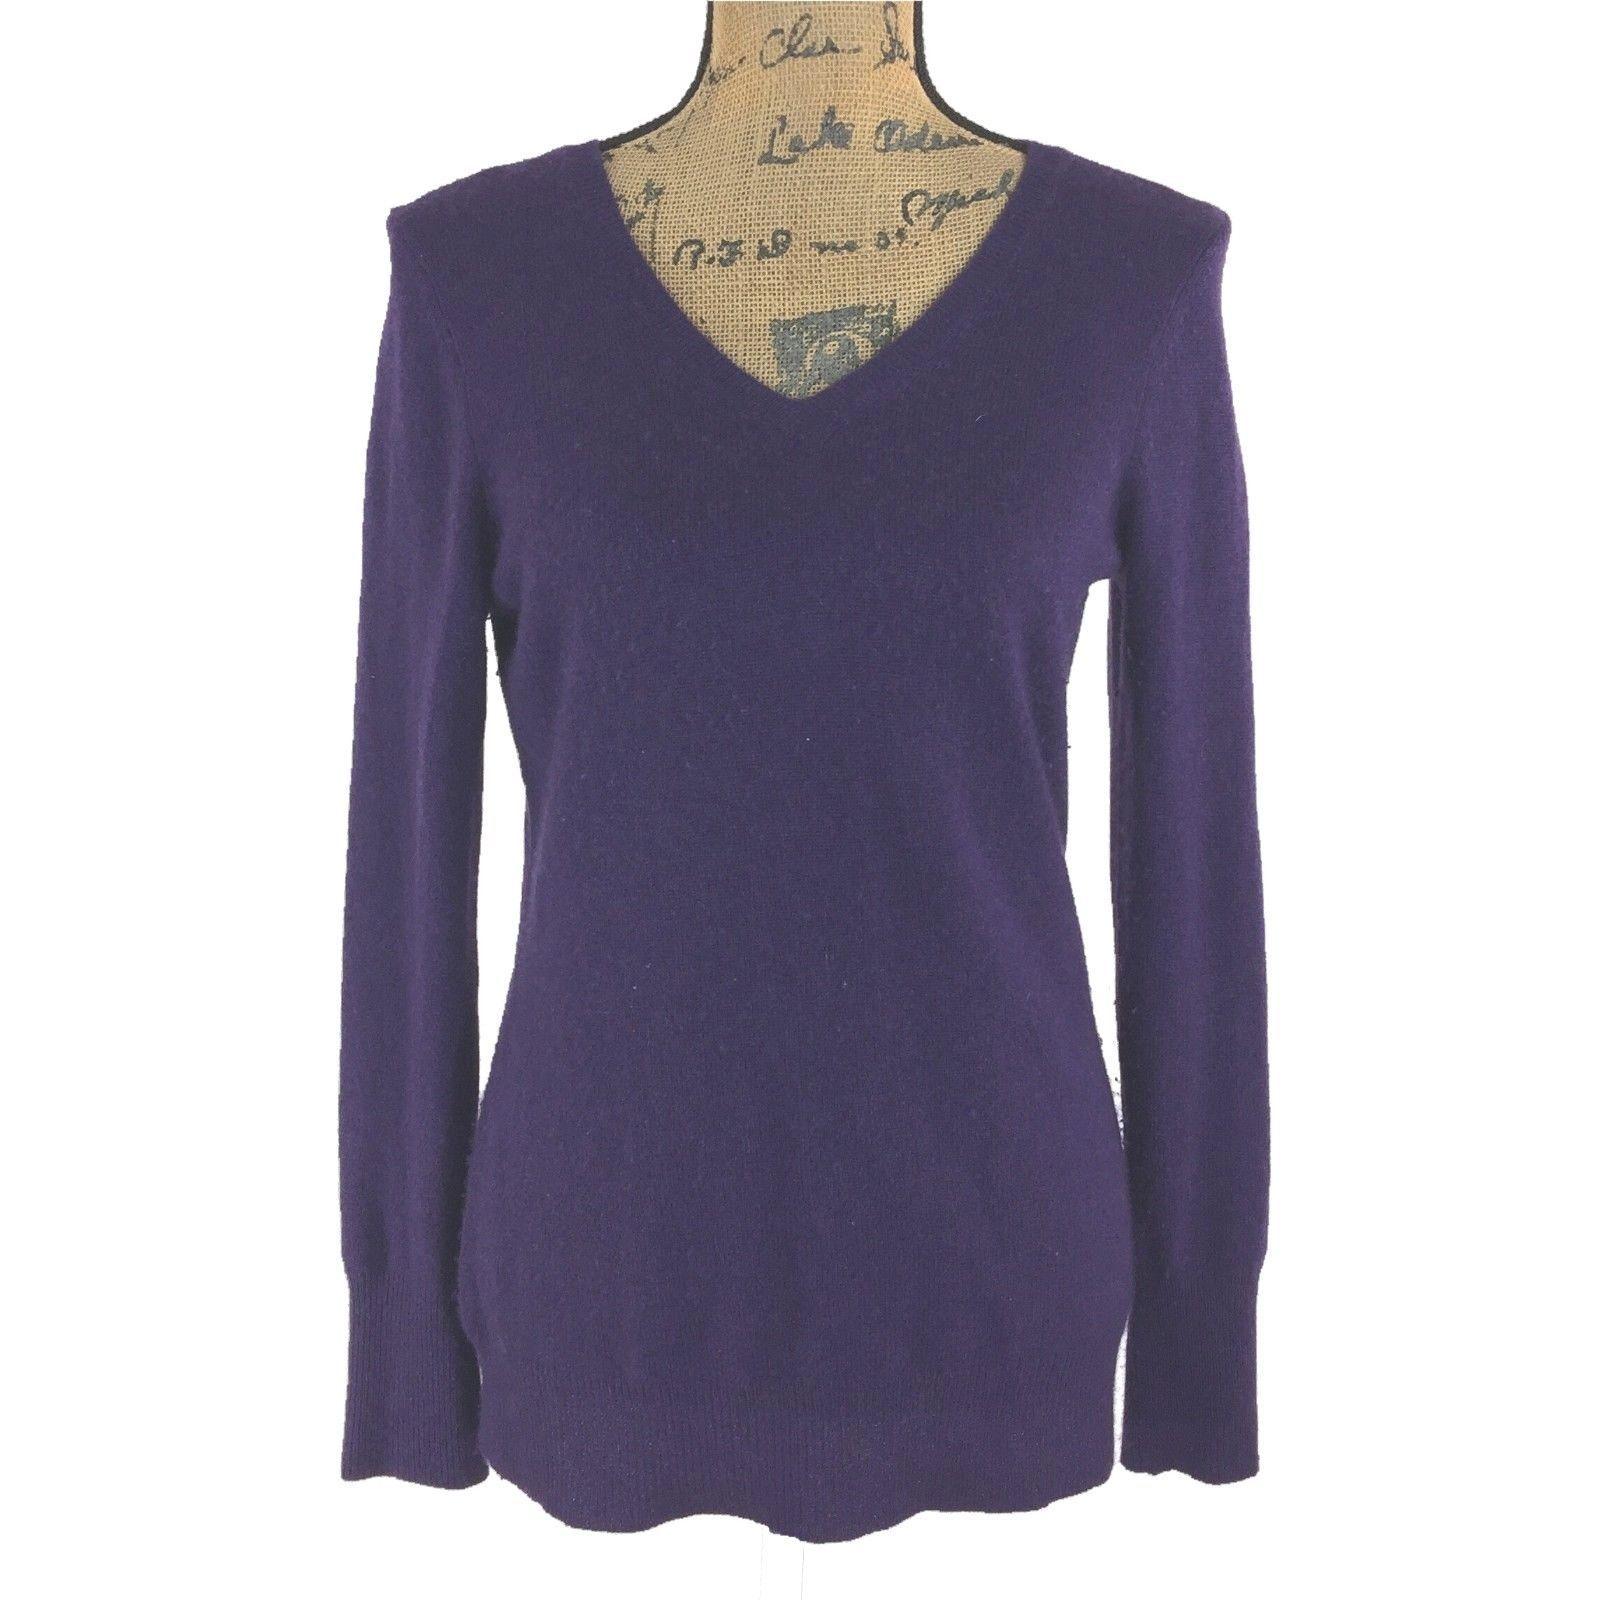 100% Cashmere Sweater Med Dark Purple Plum ALEX MARIE Long Sl V Neck Stretch LN